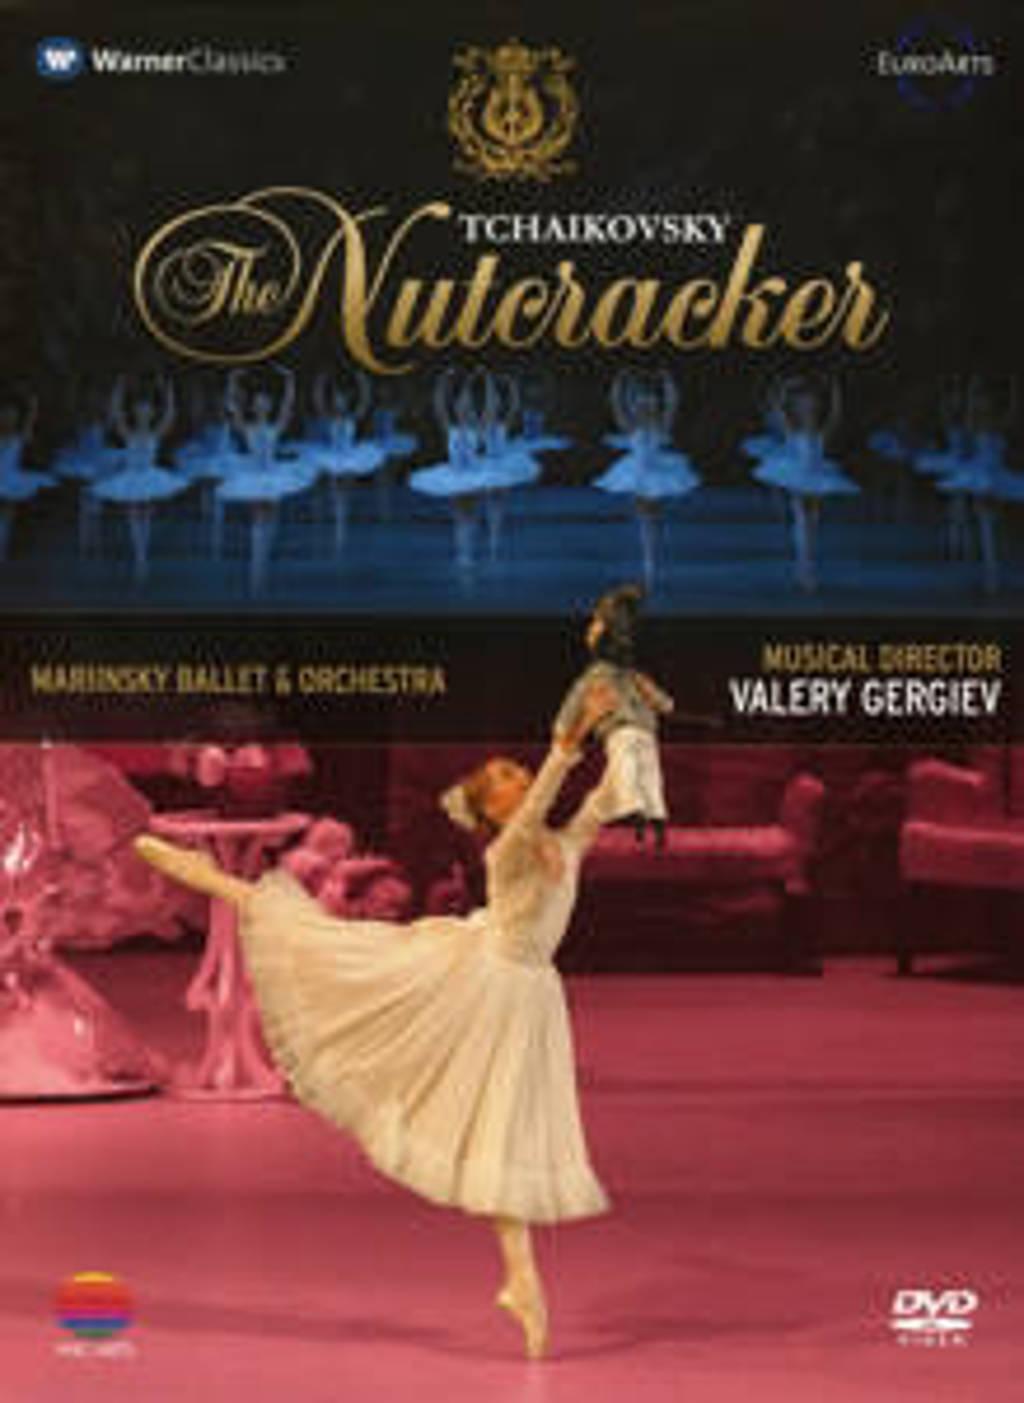 Mariinsky Ballet&Orchestra - Tcha:Nutcracker,The (DVD)